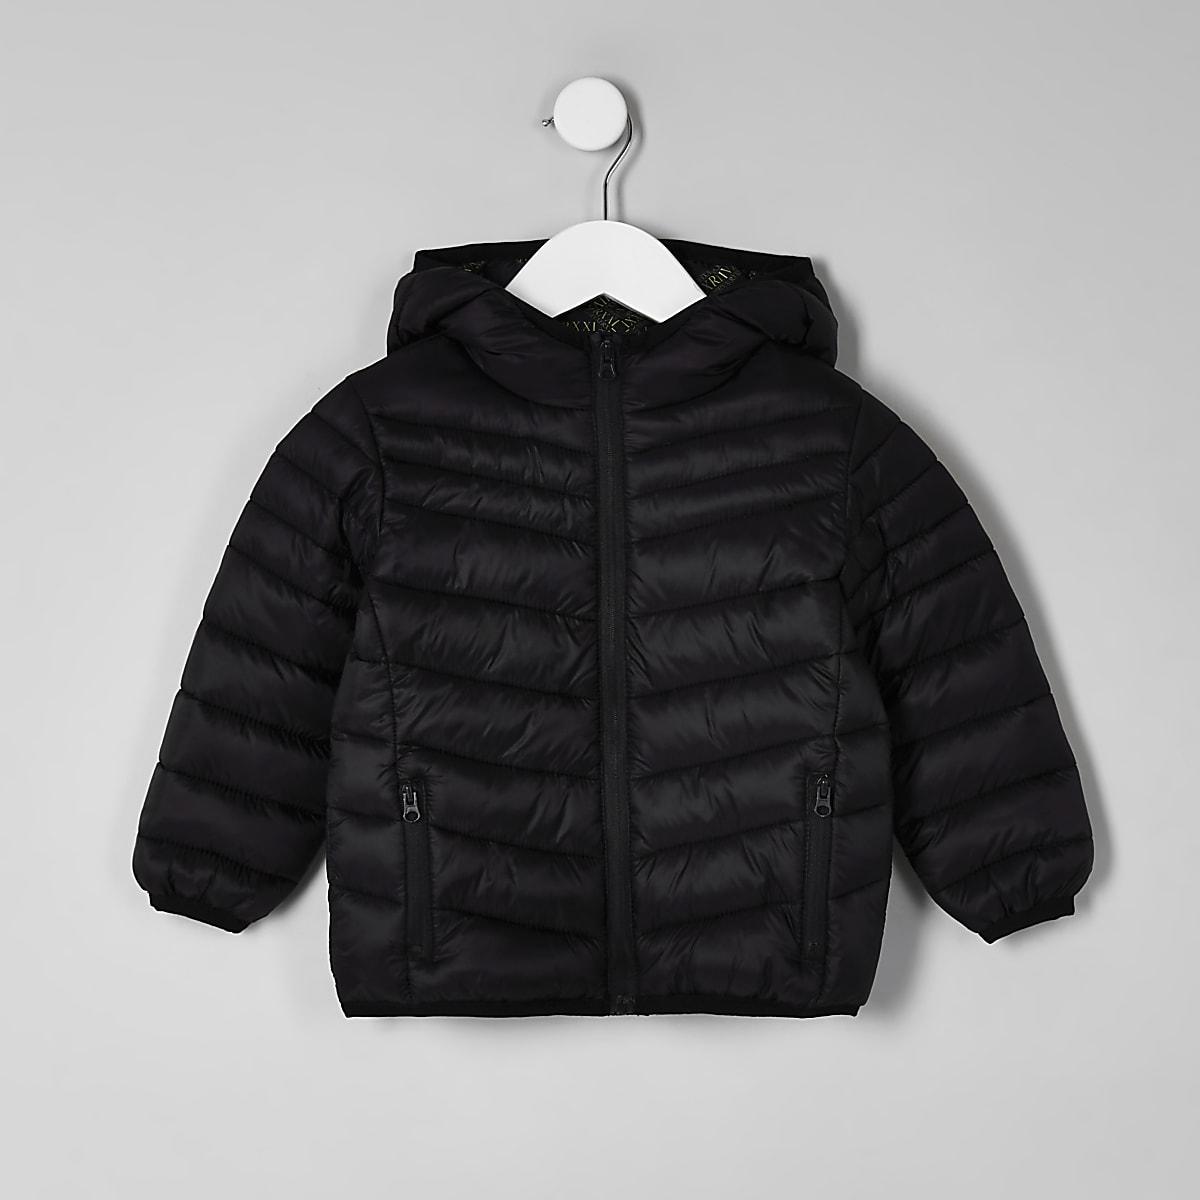 e5c05ce90 Mini boys black puffer jacket - Baby Boys Coats & Jackets - Mini Boys - boys